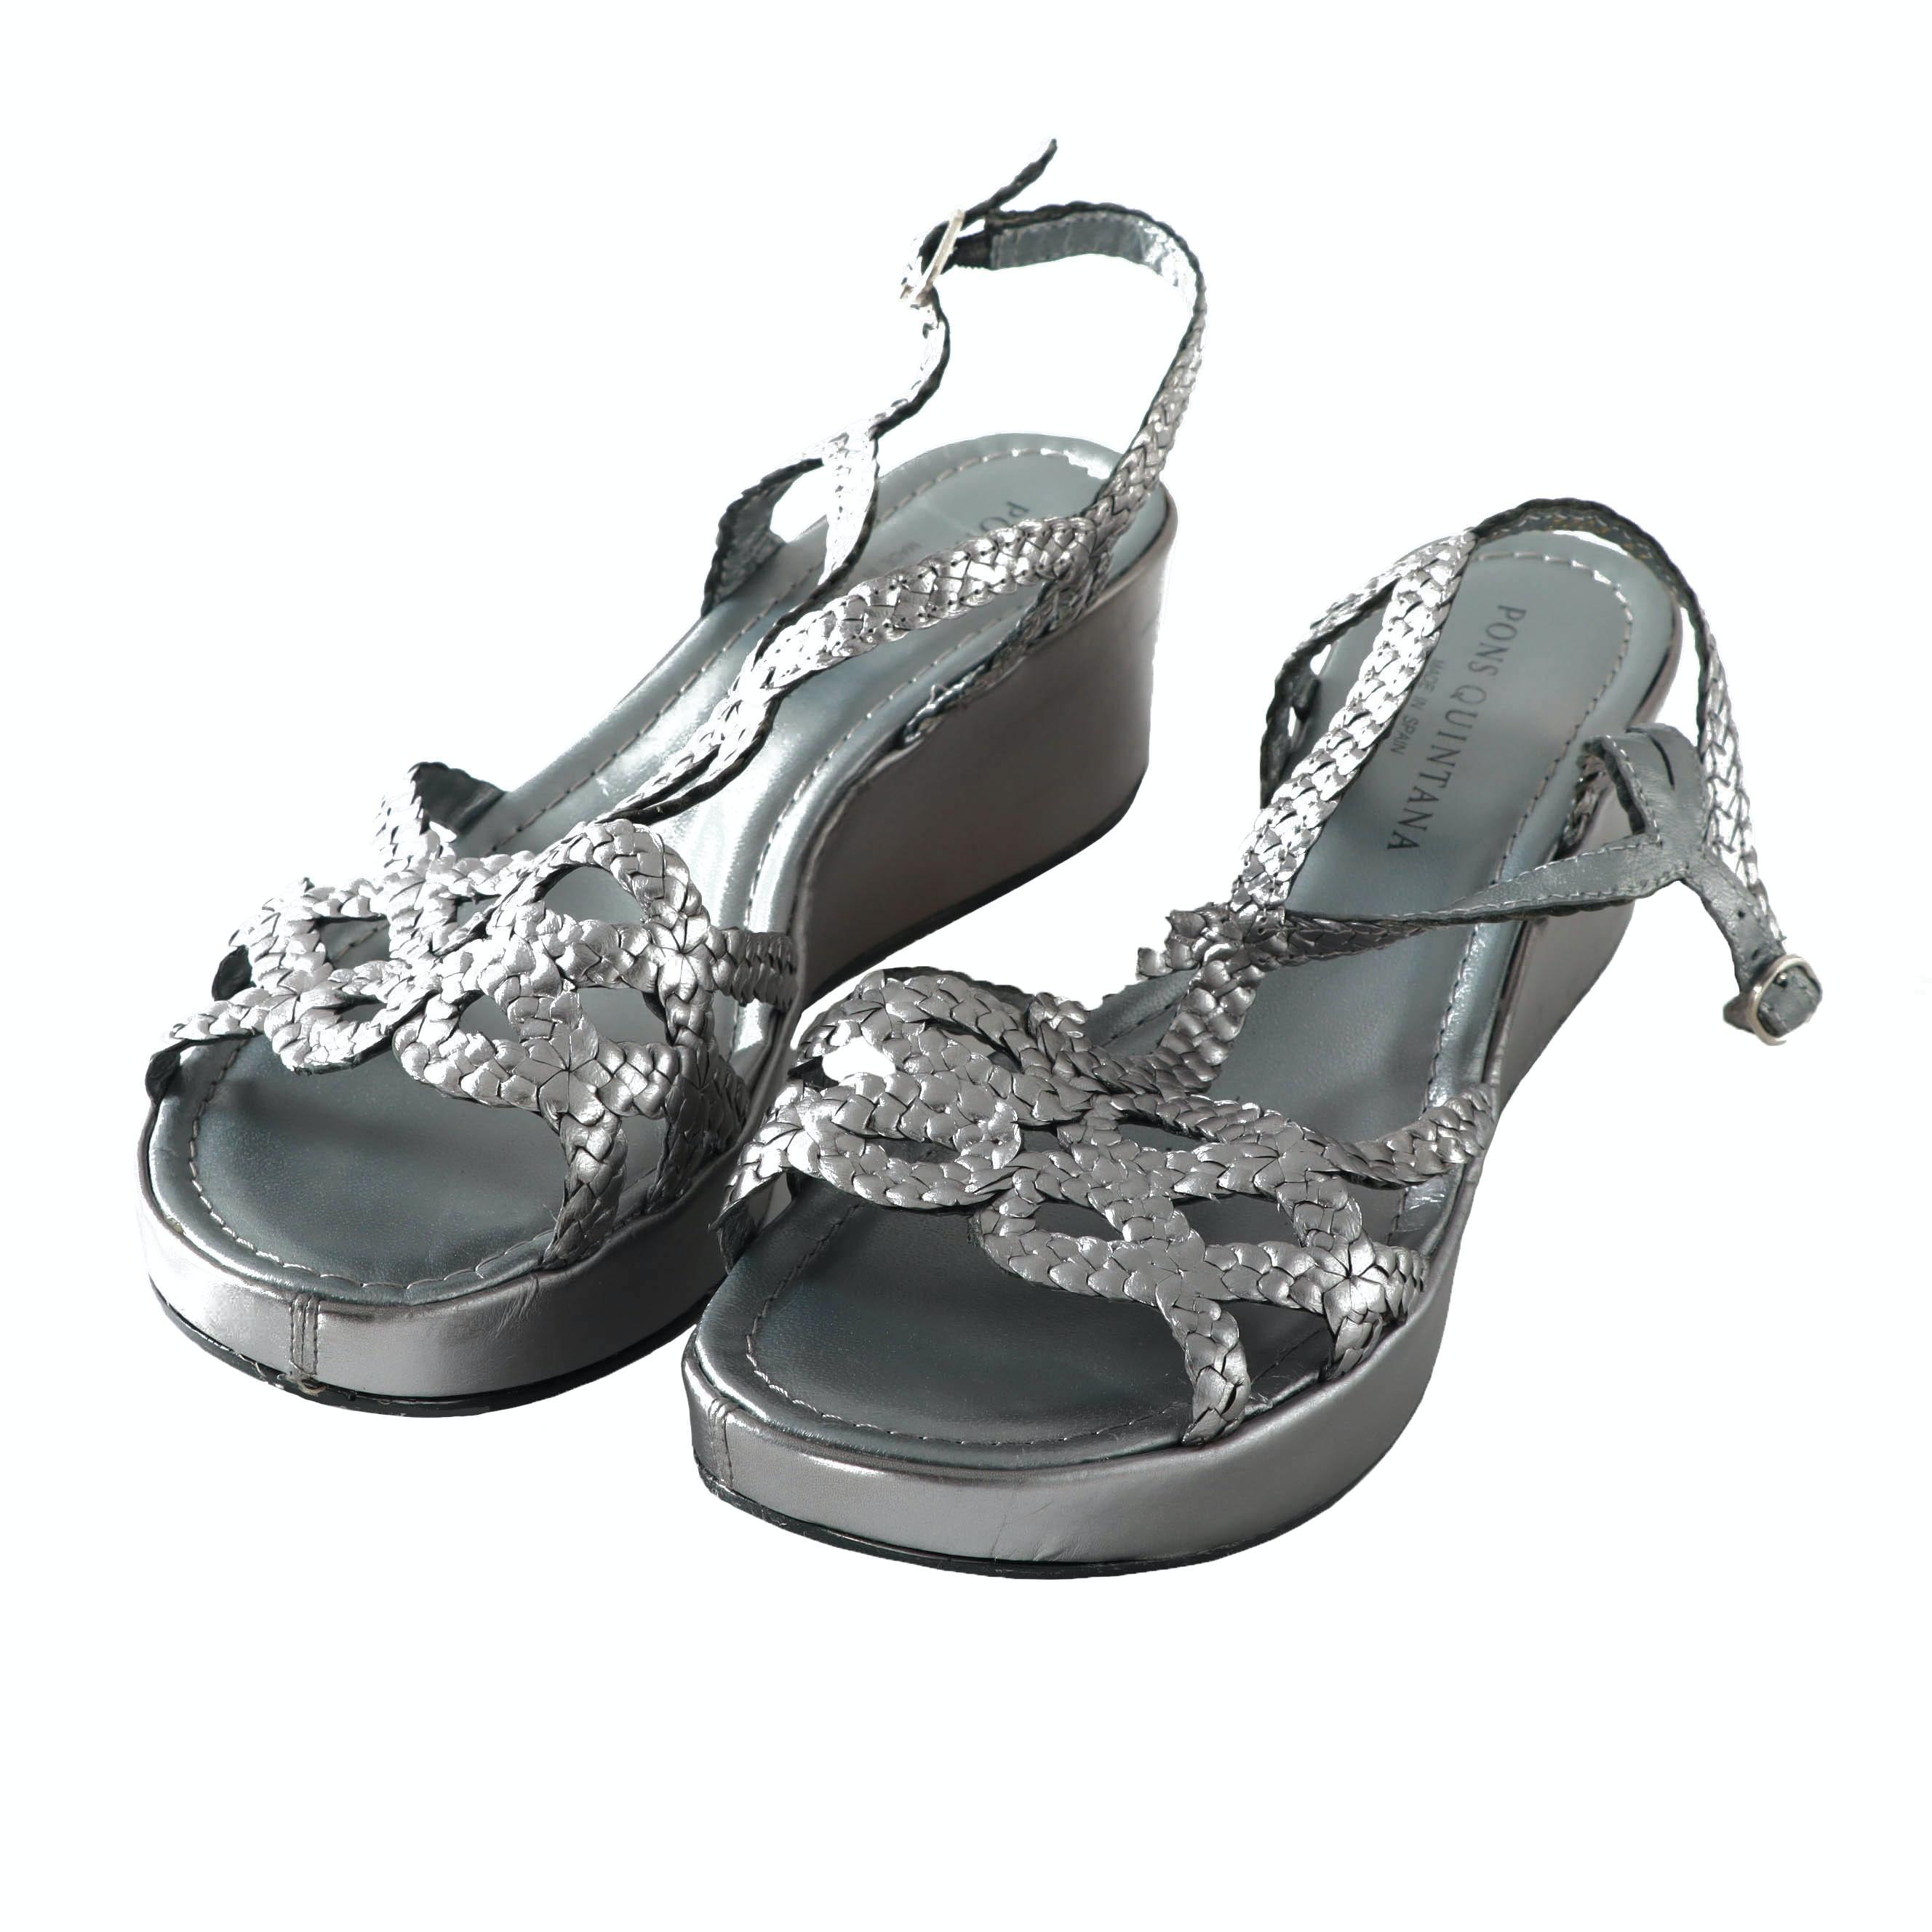 Pons Quintana Metallic Leather Wedge Sandals